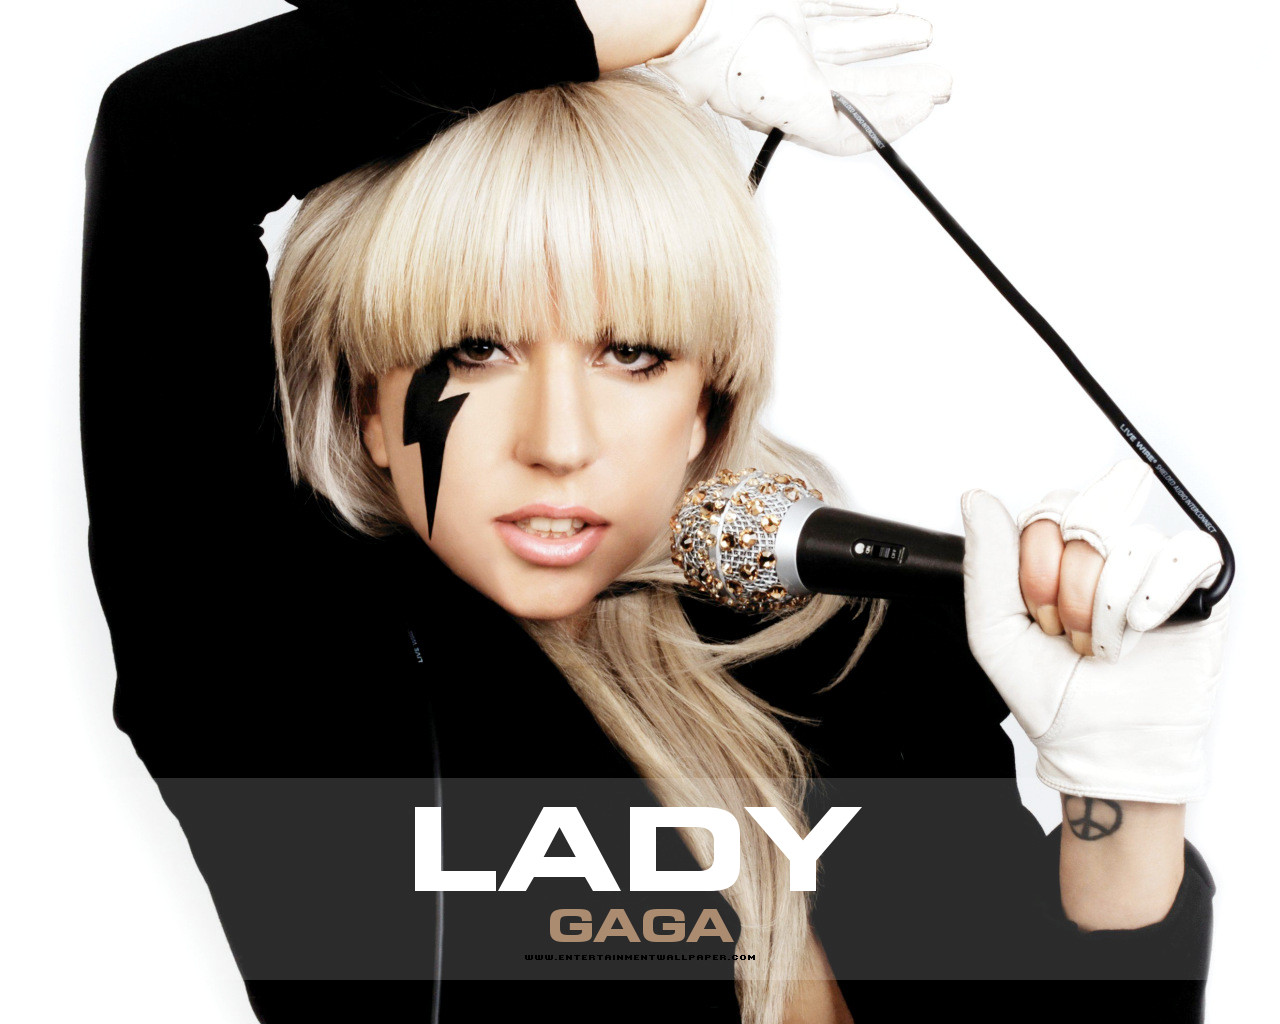 http://4.bp.blogspot.com/_C7TuL7o0Jmo/Sw7J5uKVNhI/AAAAAAAABfk/6WhV6ttya_Y/s1600/Lady+Gaga+-+The+Fame+Monster.jpg